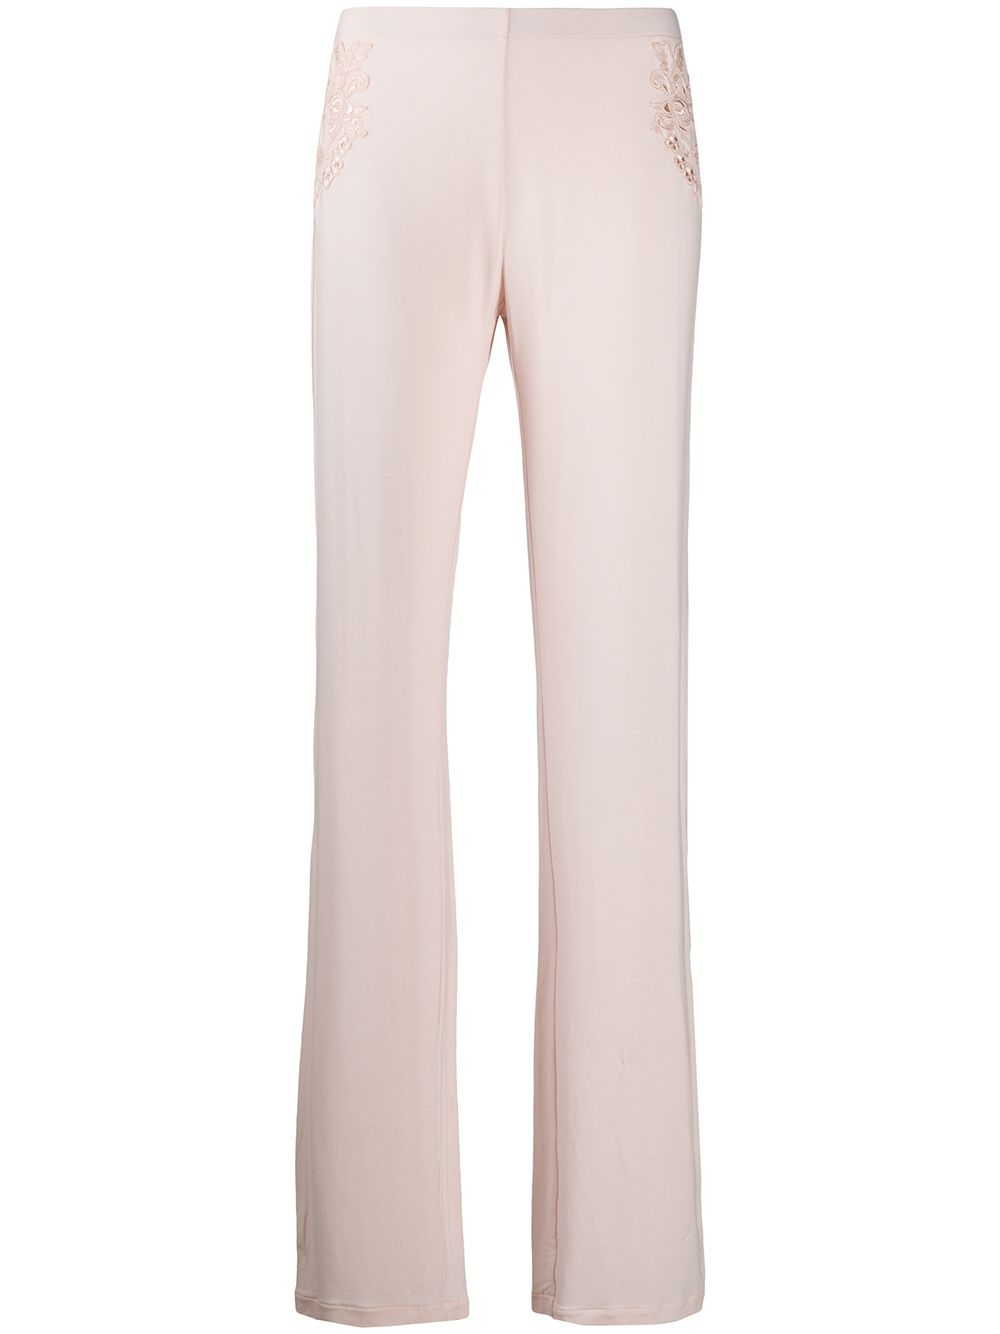 Maison Contouring Pajama Trousers